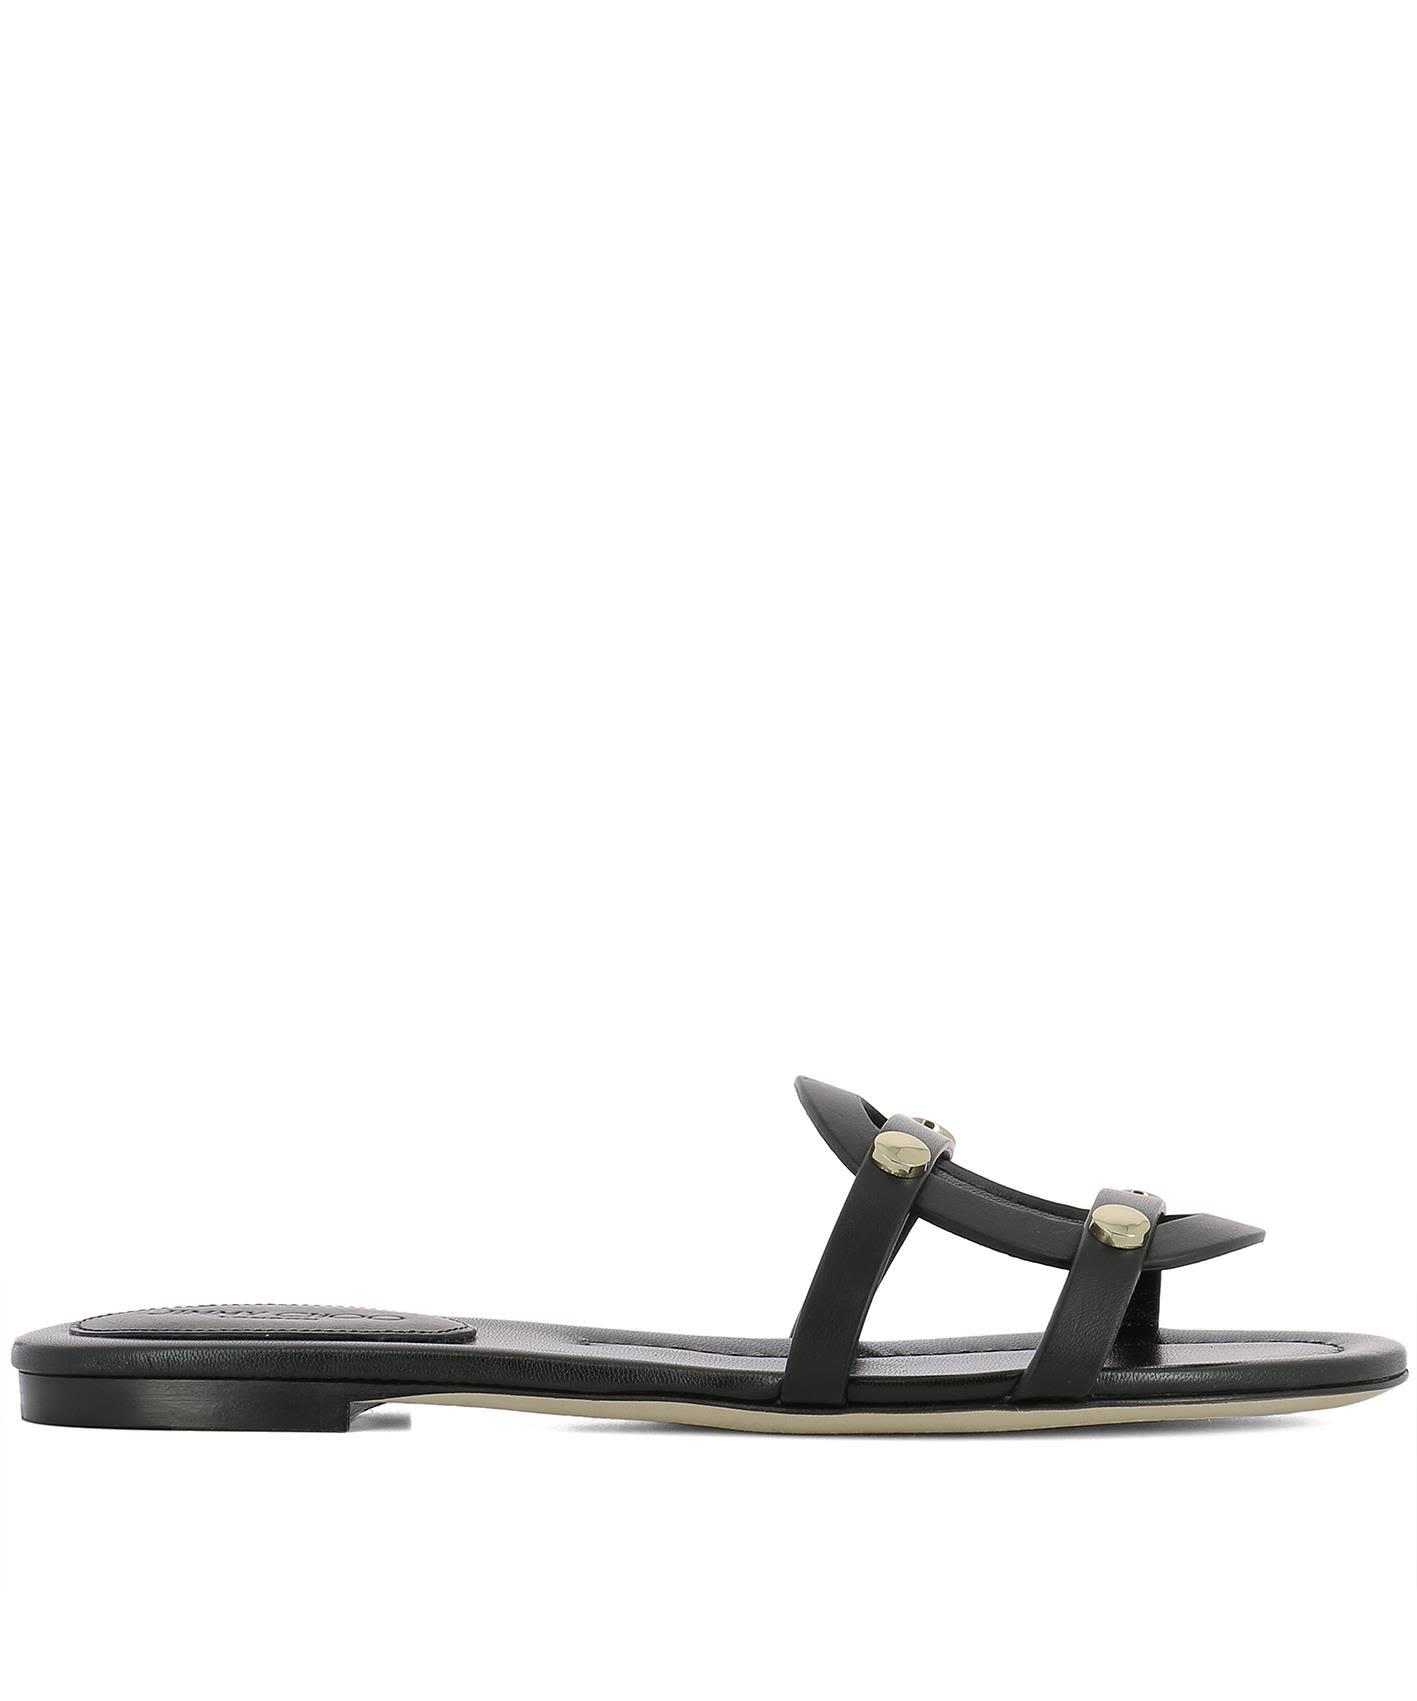 Black Leather Damaris Flat Sandals